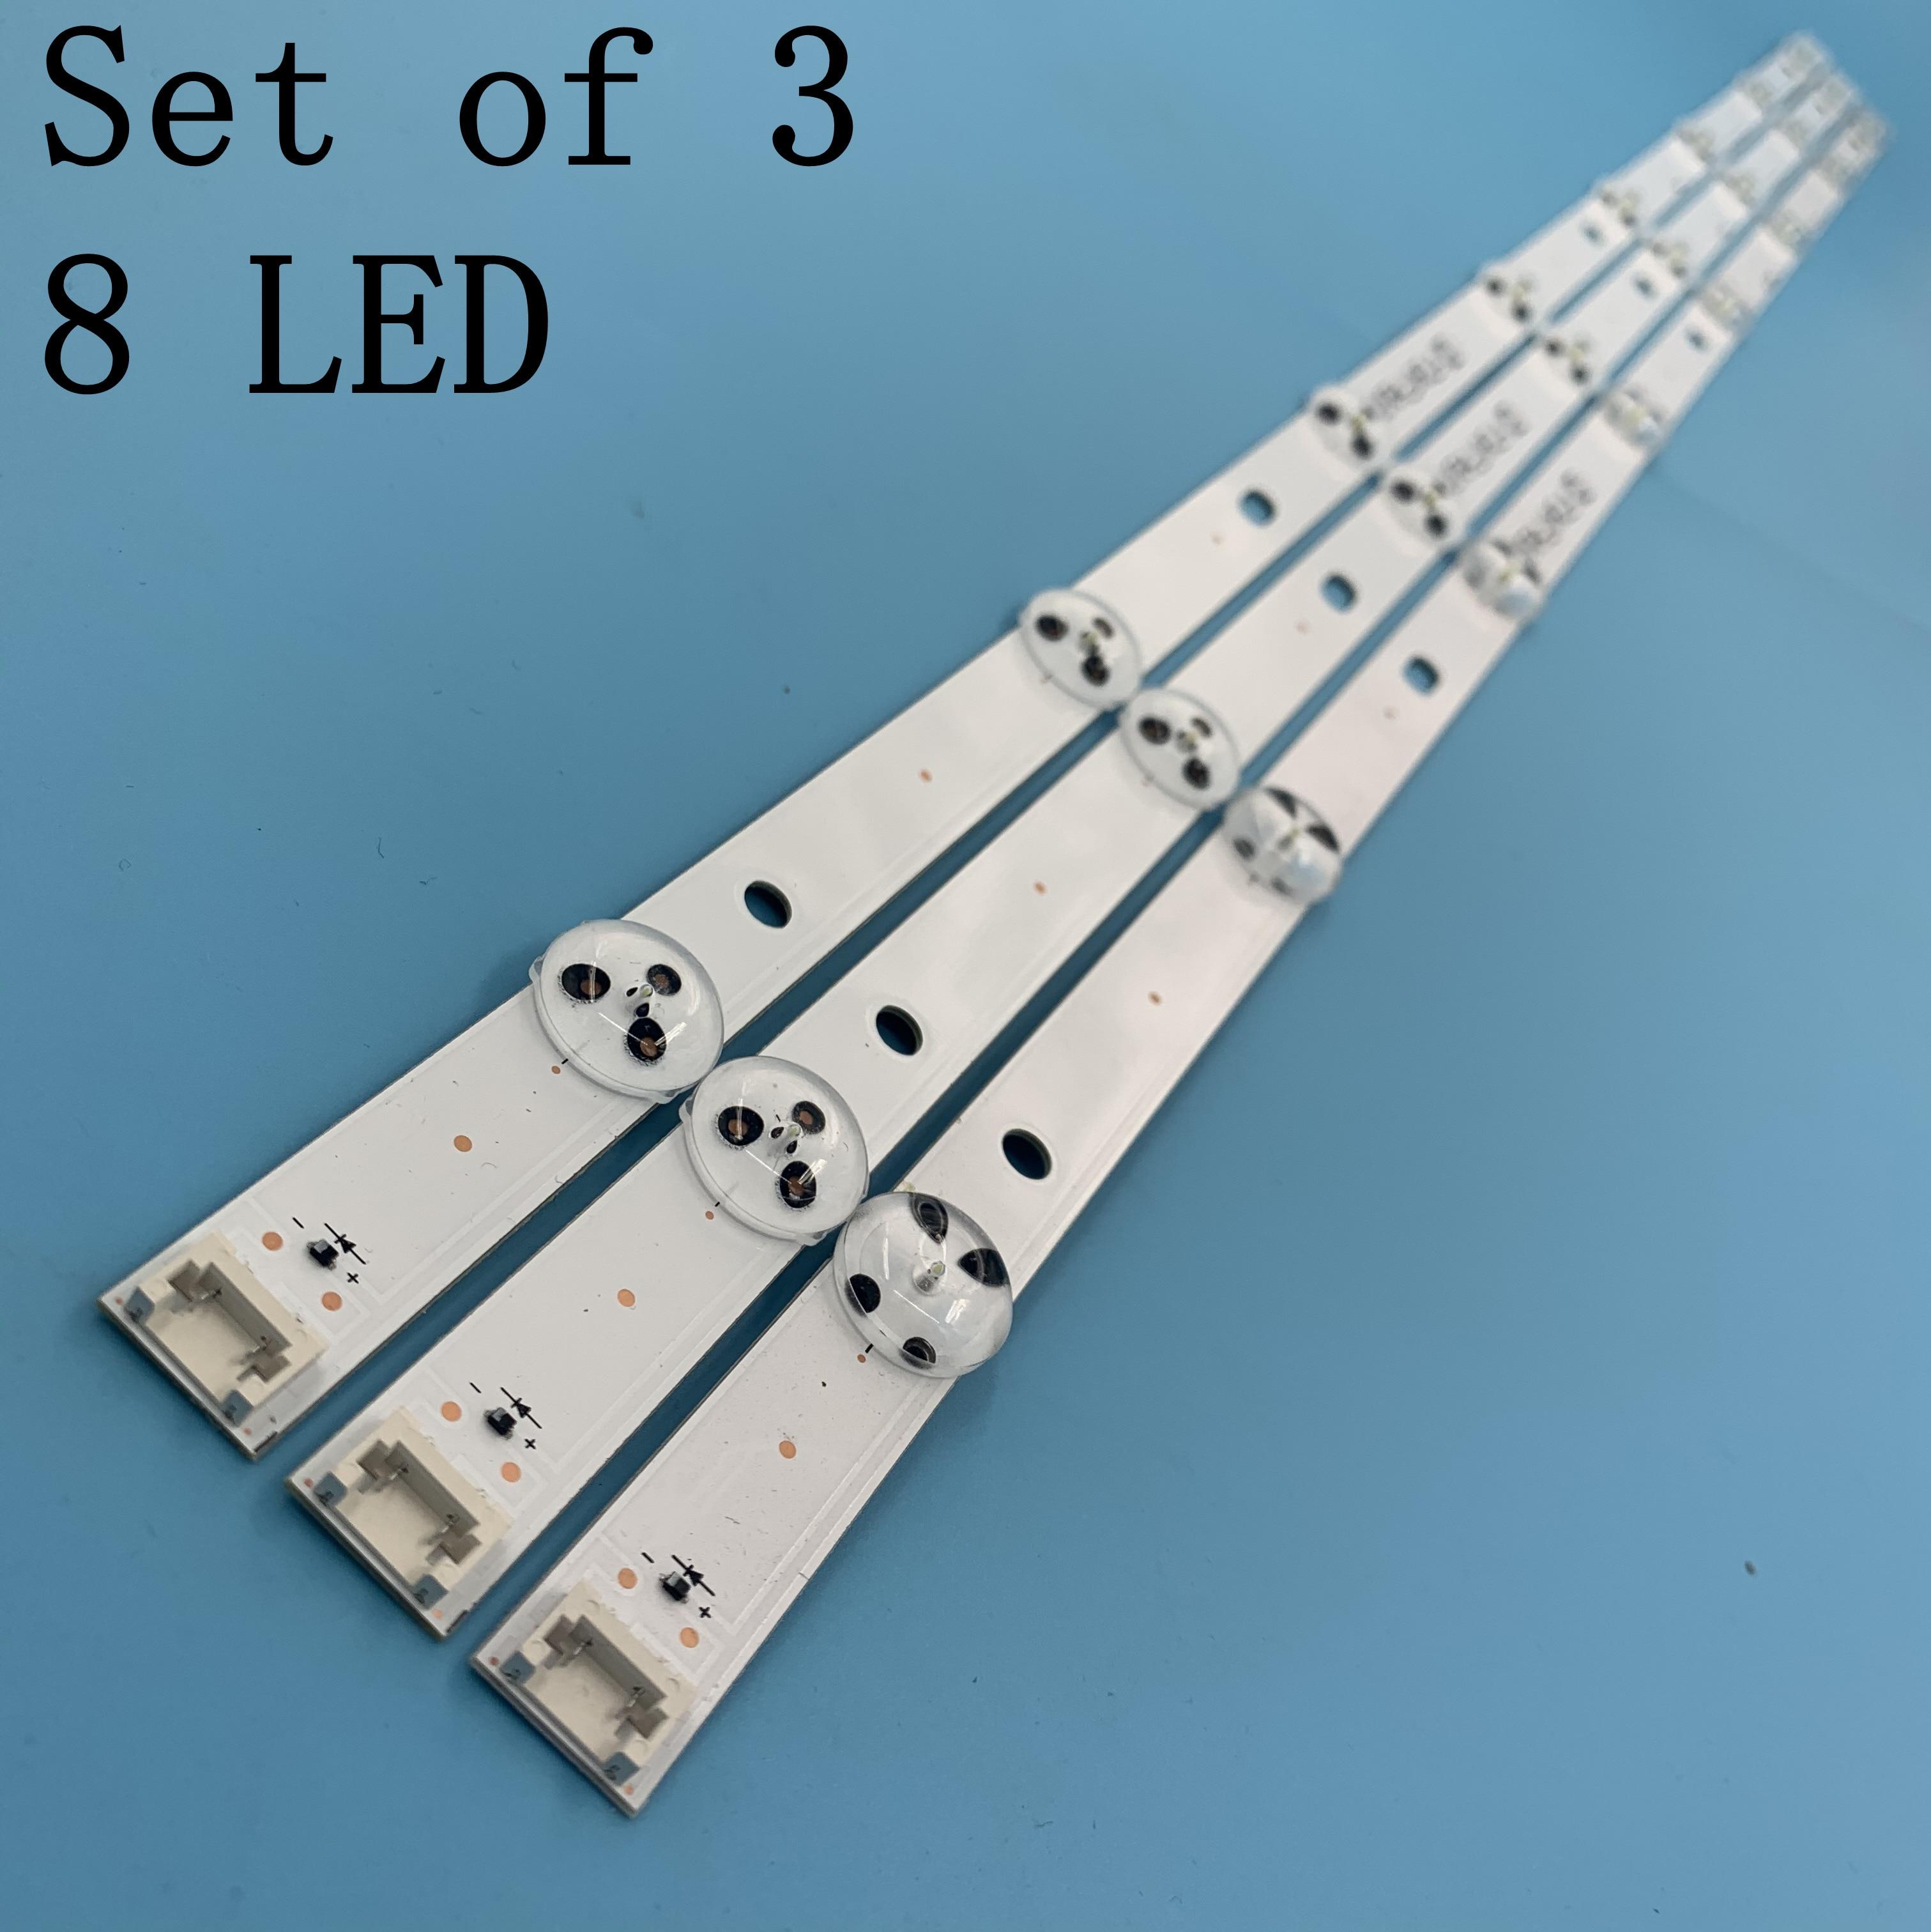 New Kit 3 PCS 8LEDs 850mm LED Backlight Strip For LG 43LH604V 43LH60_FHD_A Type UF64_UHD_A 43UH610V 43UF640 43UH610A 43LH5700